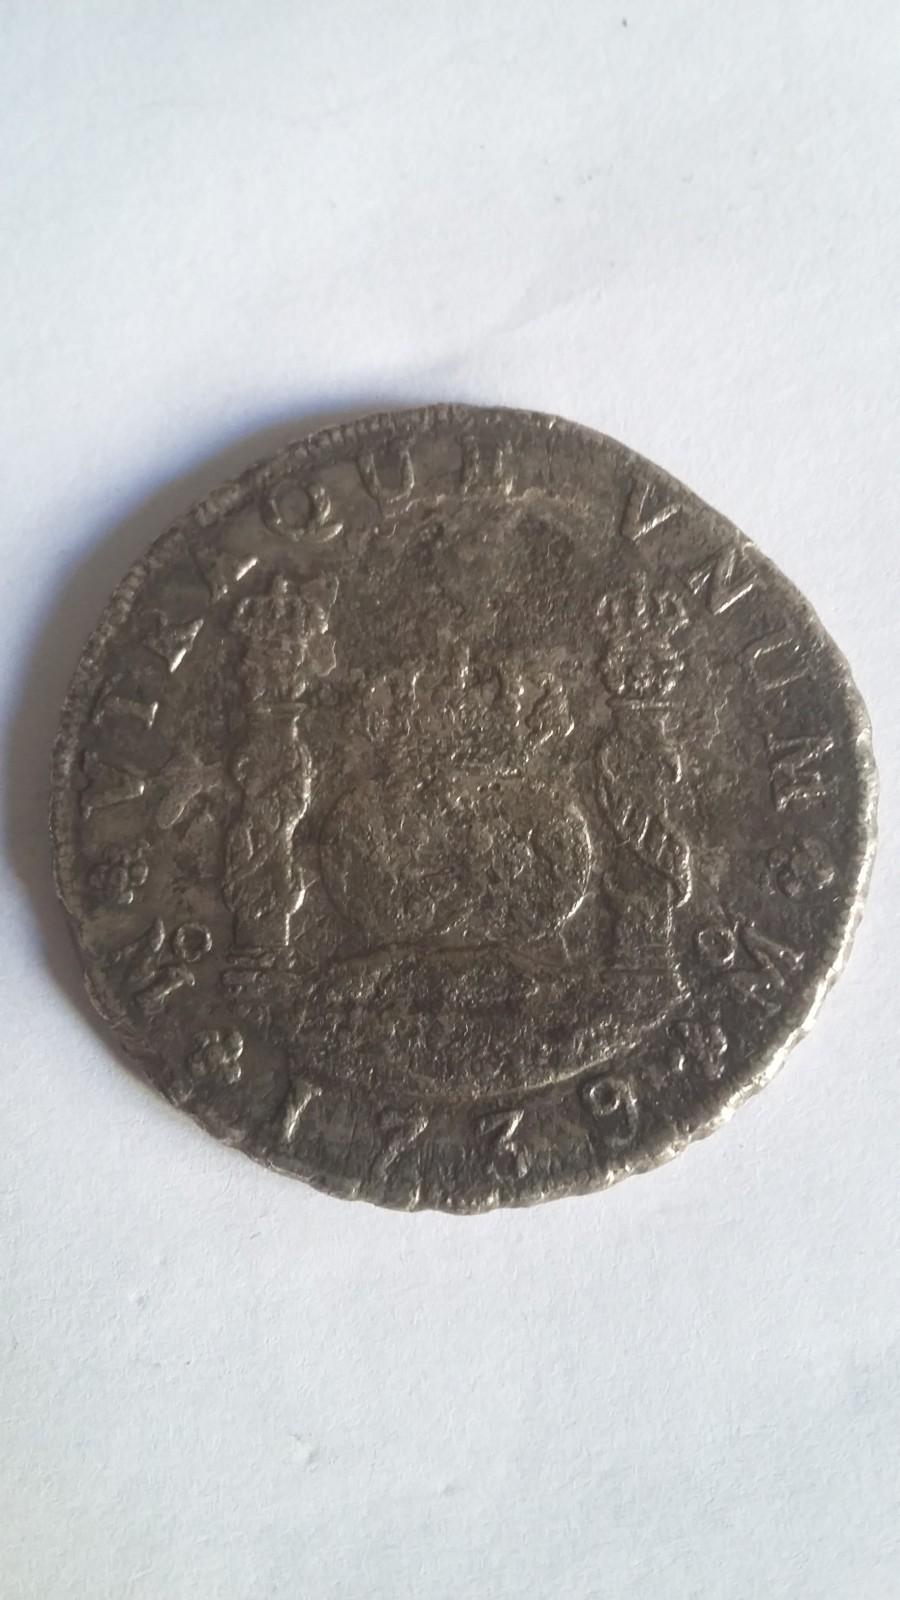 8 Reales. Felipe V. Mexico. 1739. Procedente del Hollandia 2z4l17c